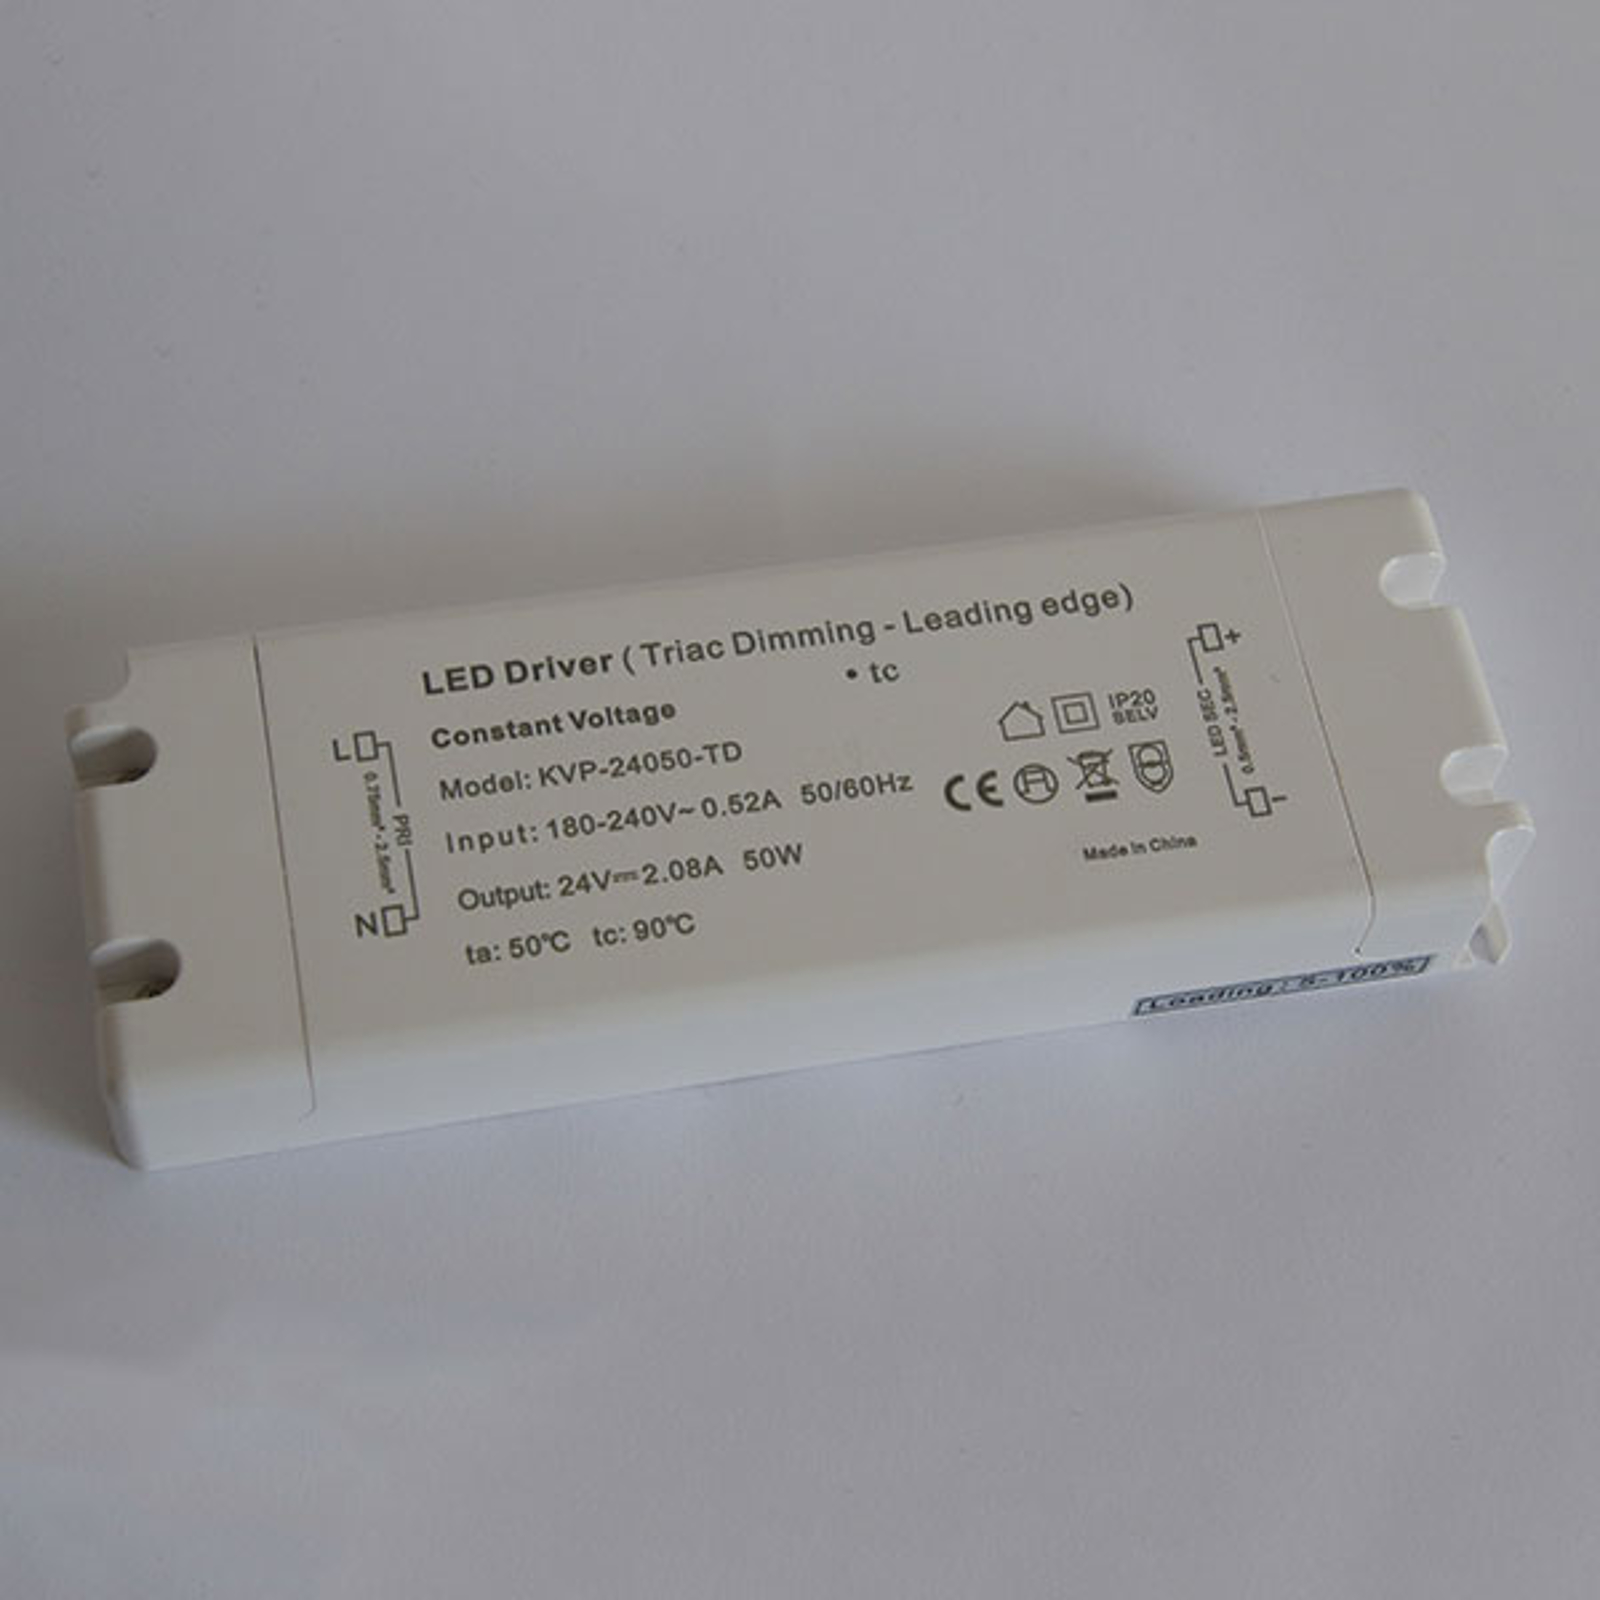 Alimentatore TRIAC dimming IP20 LED 25W